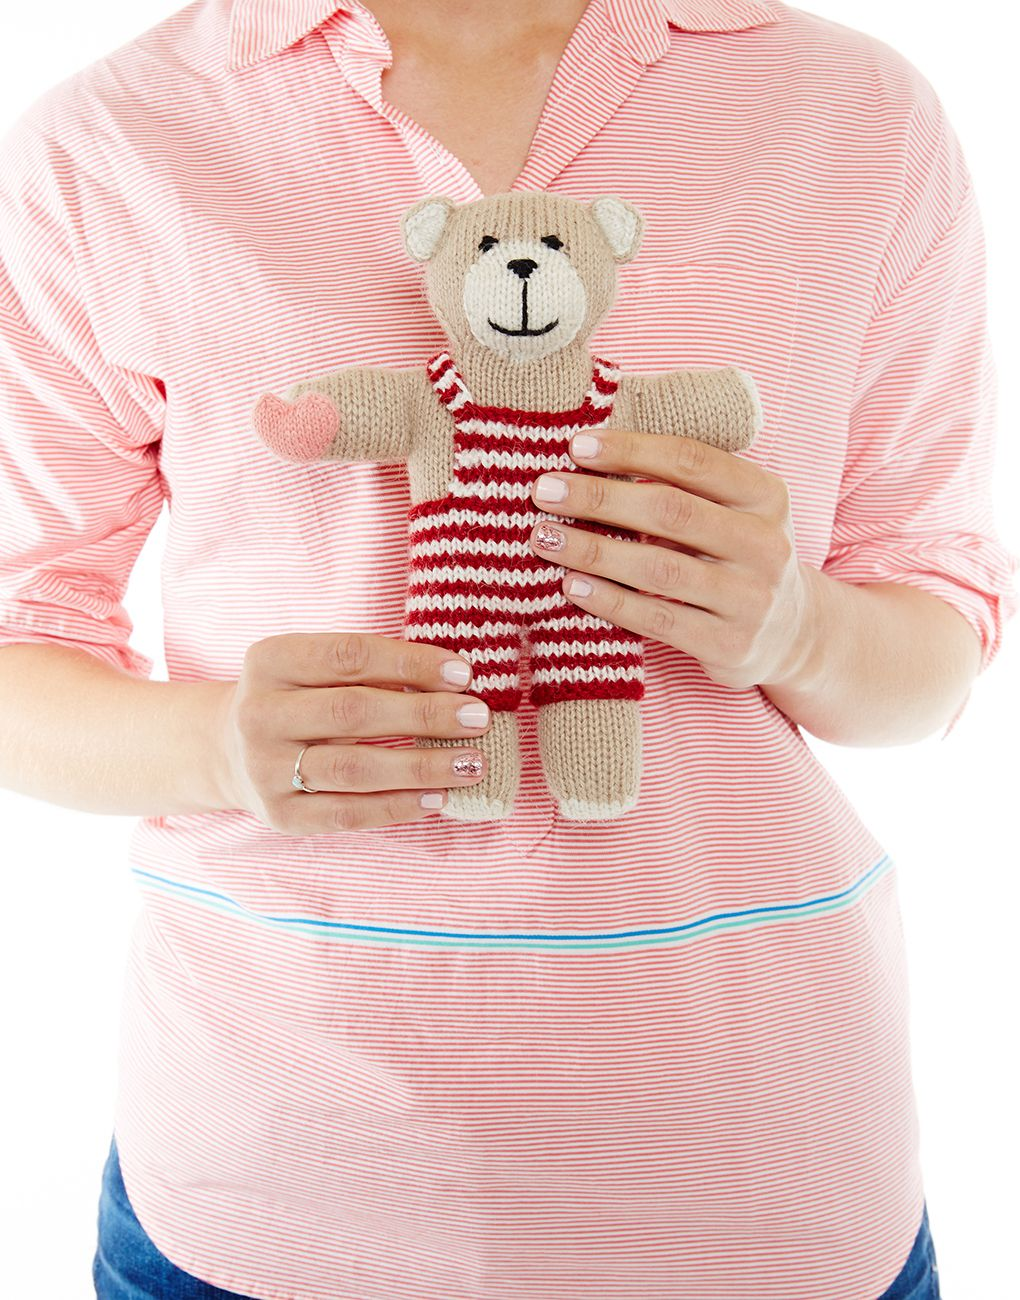 V-Day Teddy Bear {The Little Market}